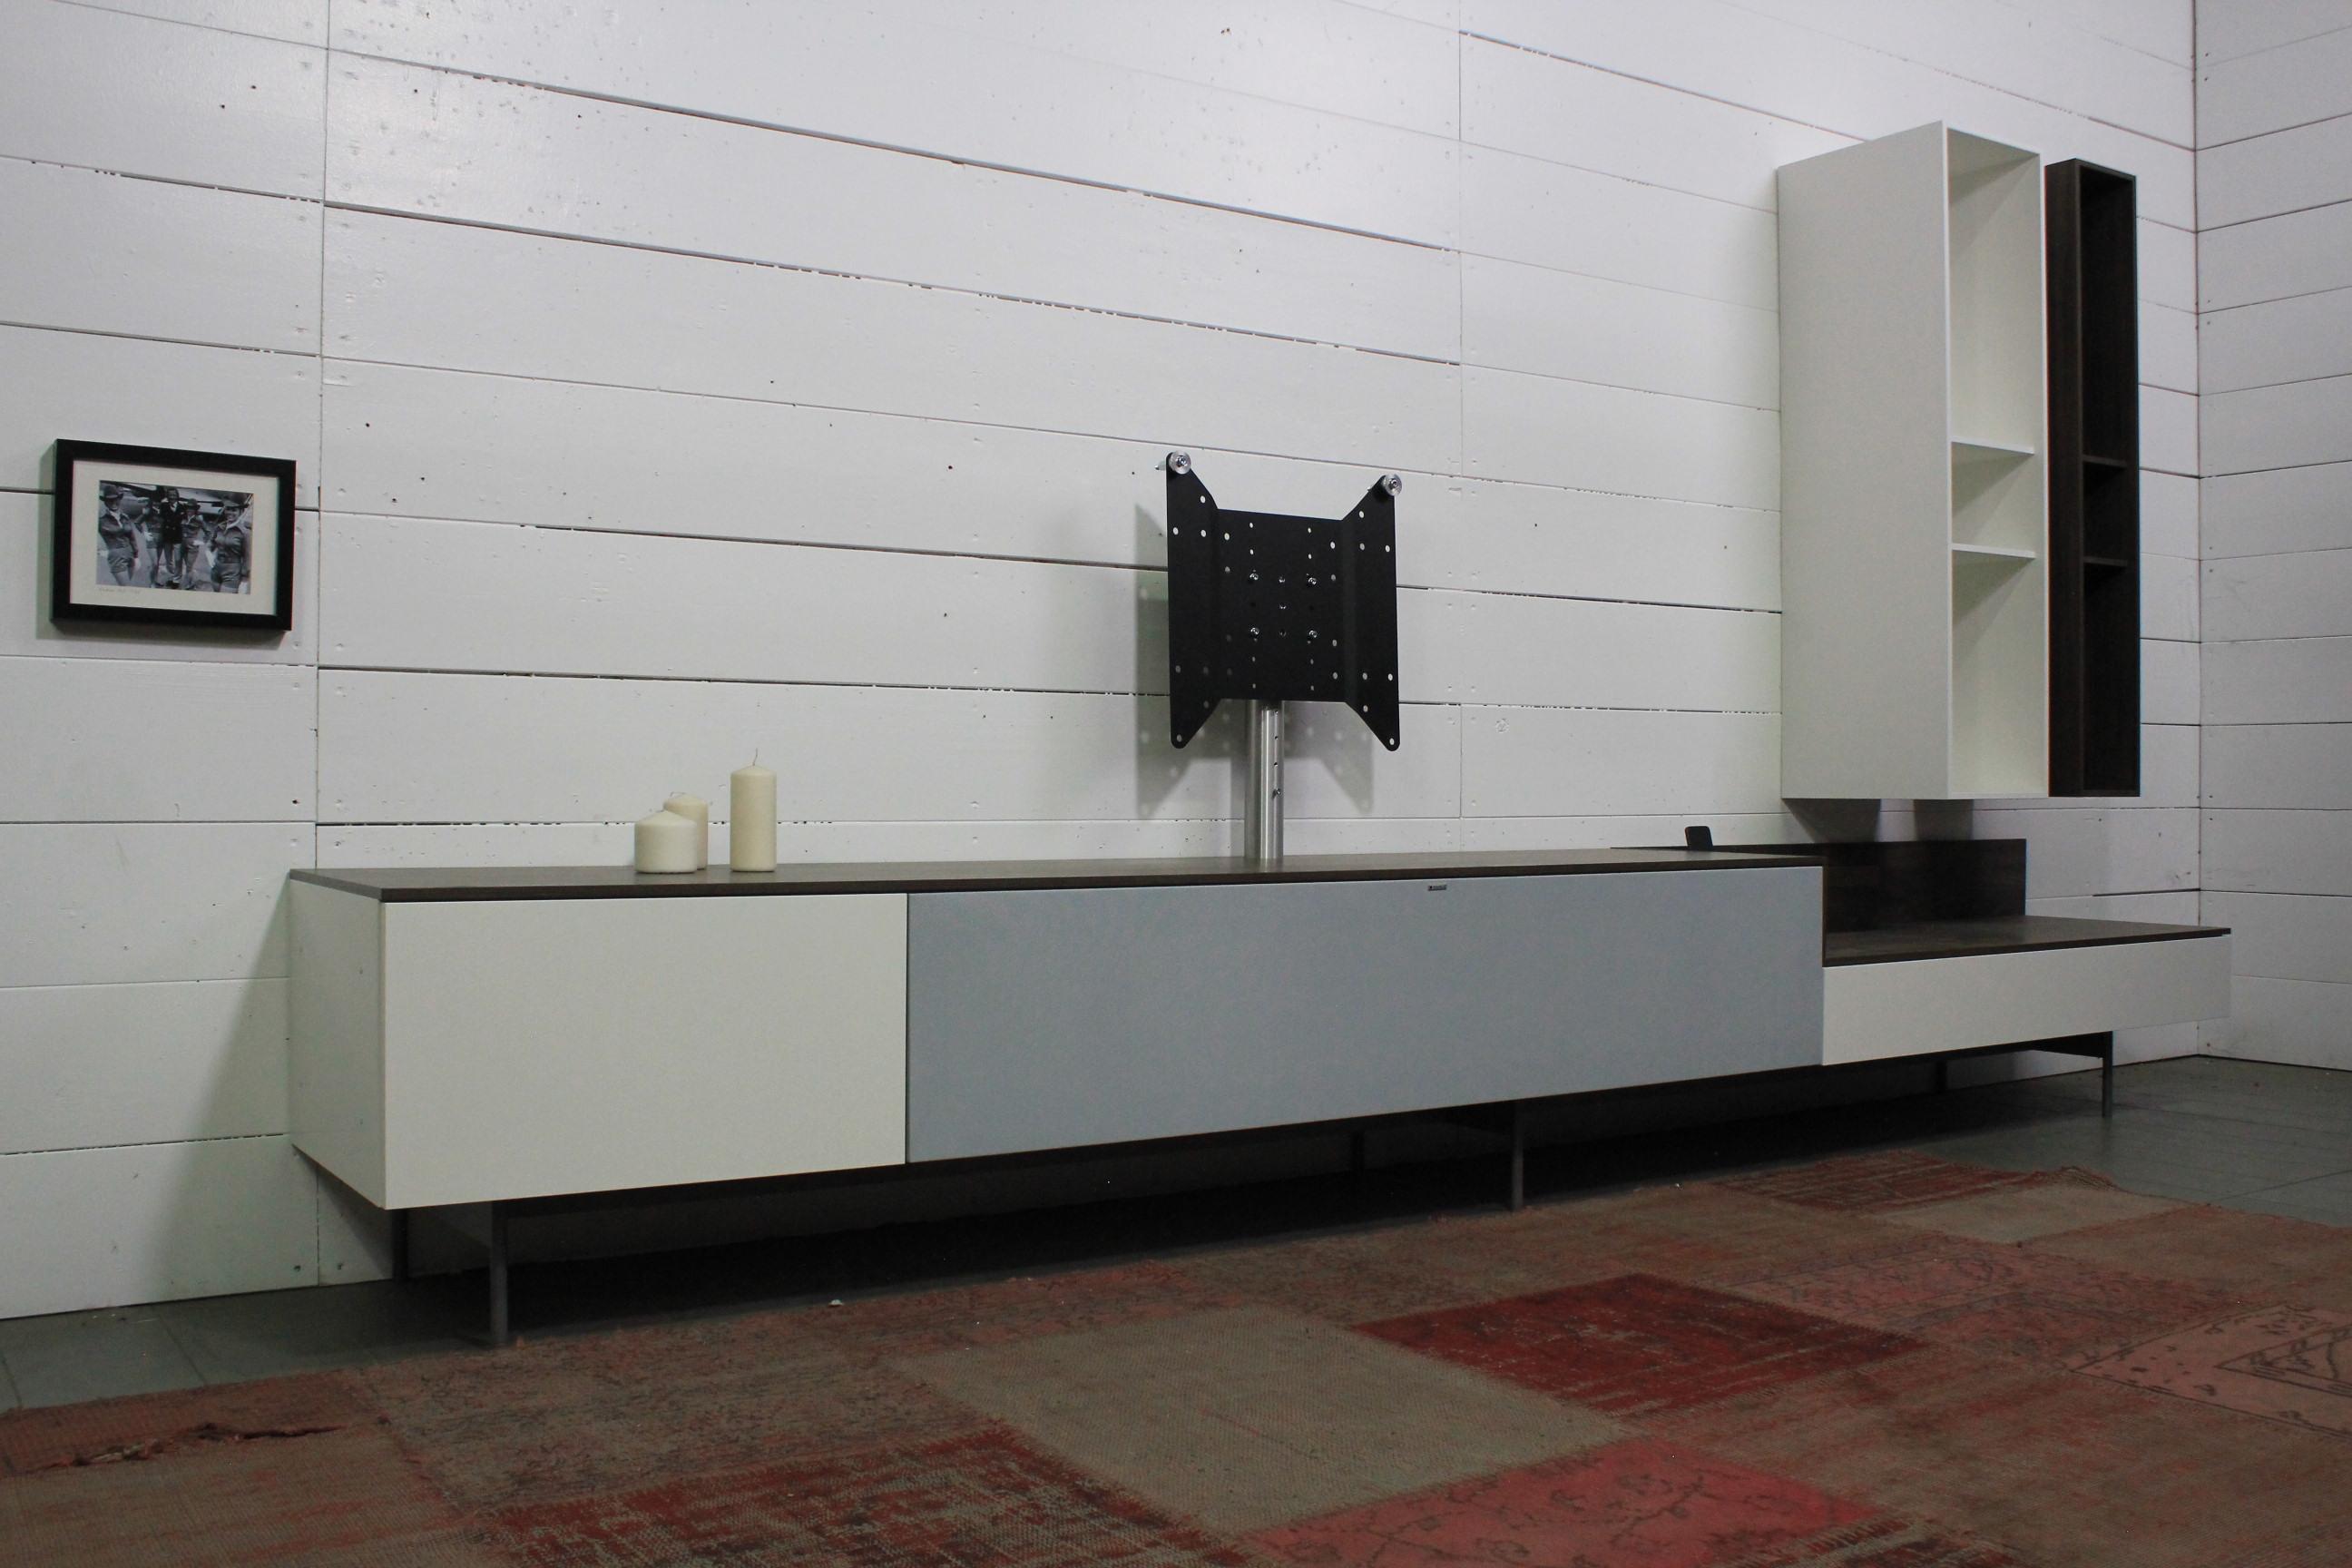 NX5506 Kombi 340cm für Soundbar Integration (ohne Hängeschränke)